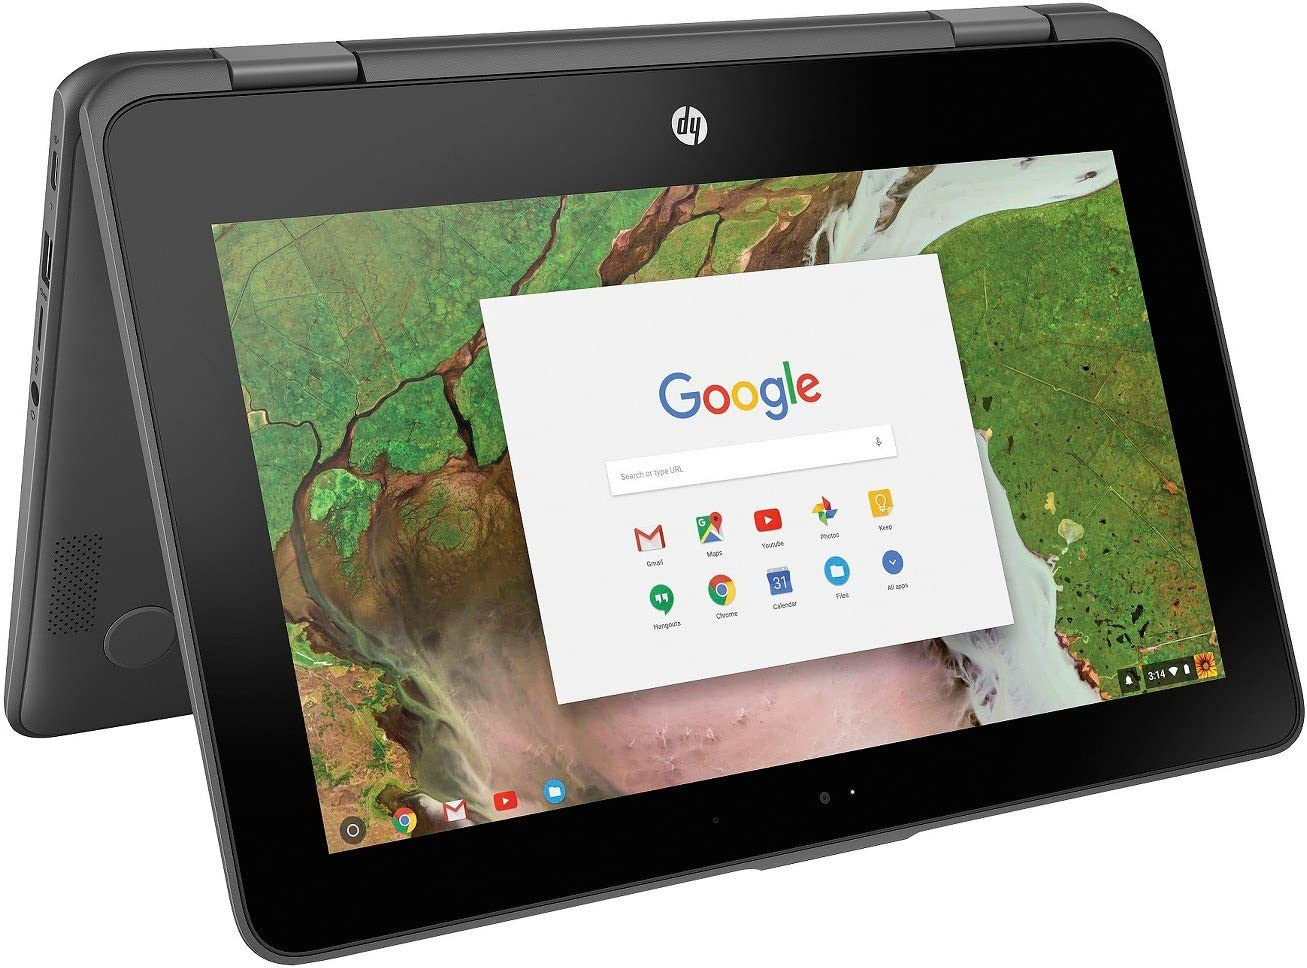 Newest HP 2-in-1 Business Chromebook 11.6in HD IPS Touchscreen, Intel Celeron N3350 Processor, 4GB Ram 16GB SSD, Intel HD Graphics, WiFi, Webcam, Google Chrome OS- Gray (Renewed)